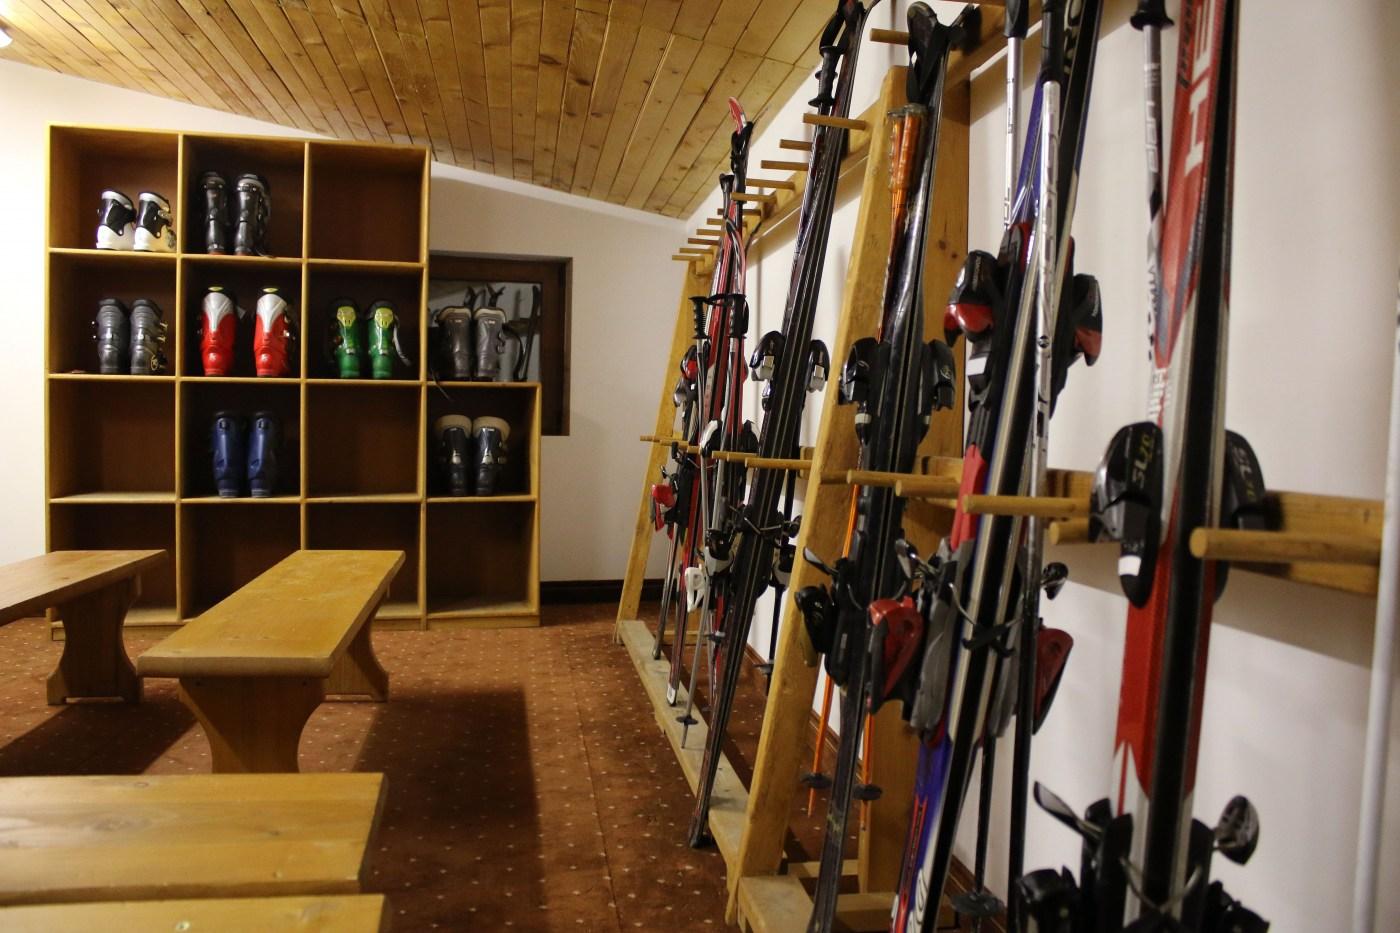 Ski rental and Ski Tuition